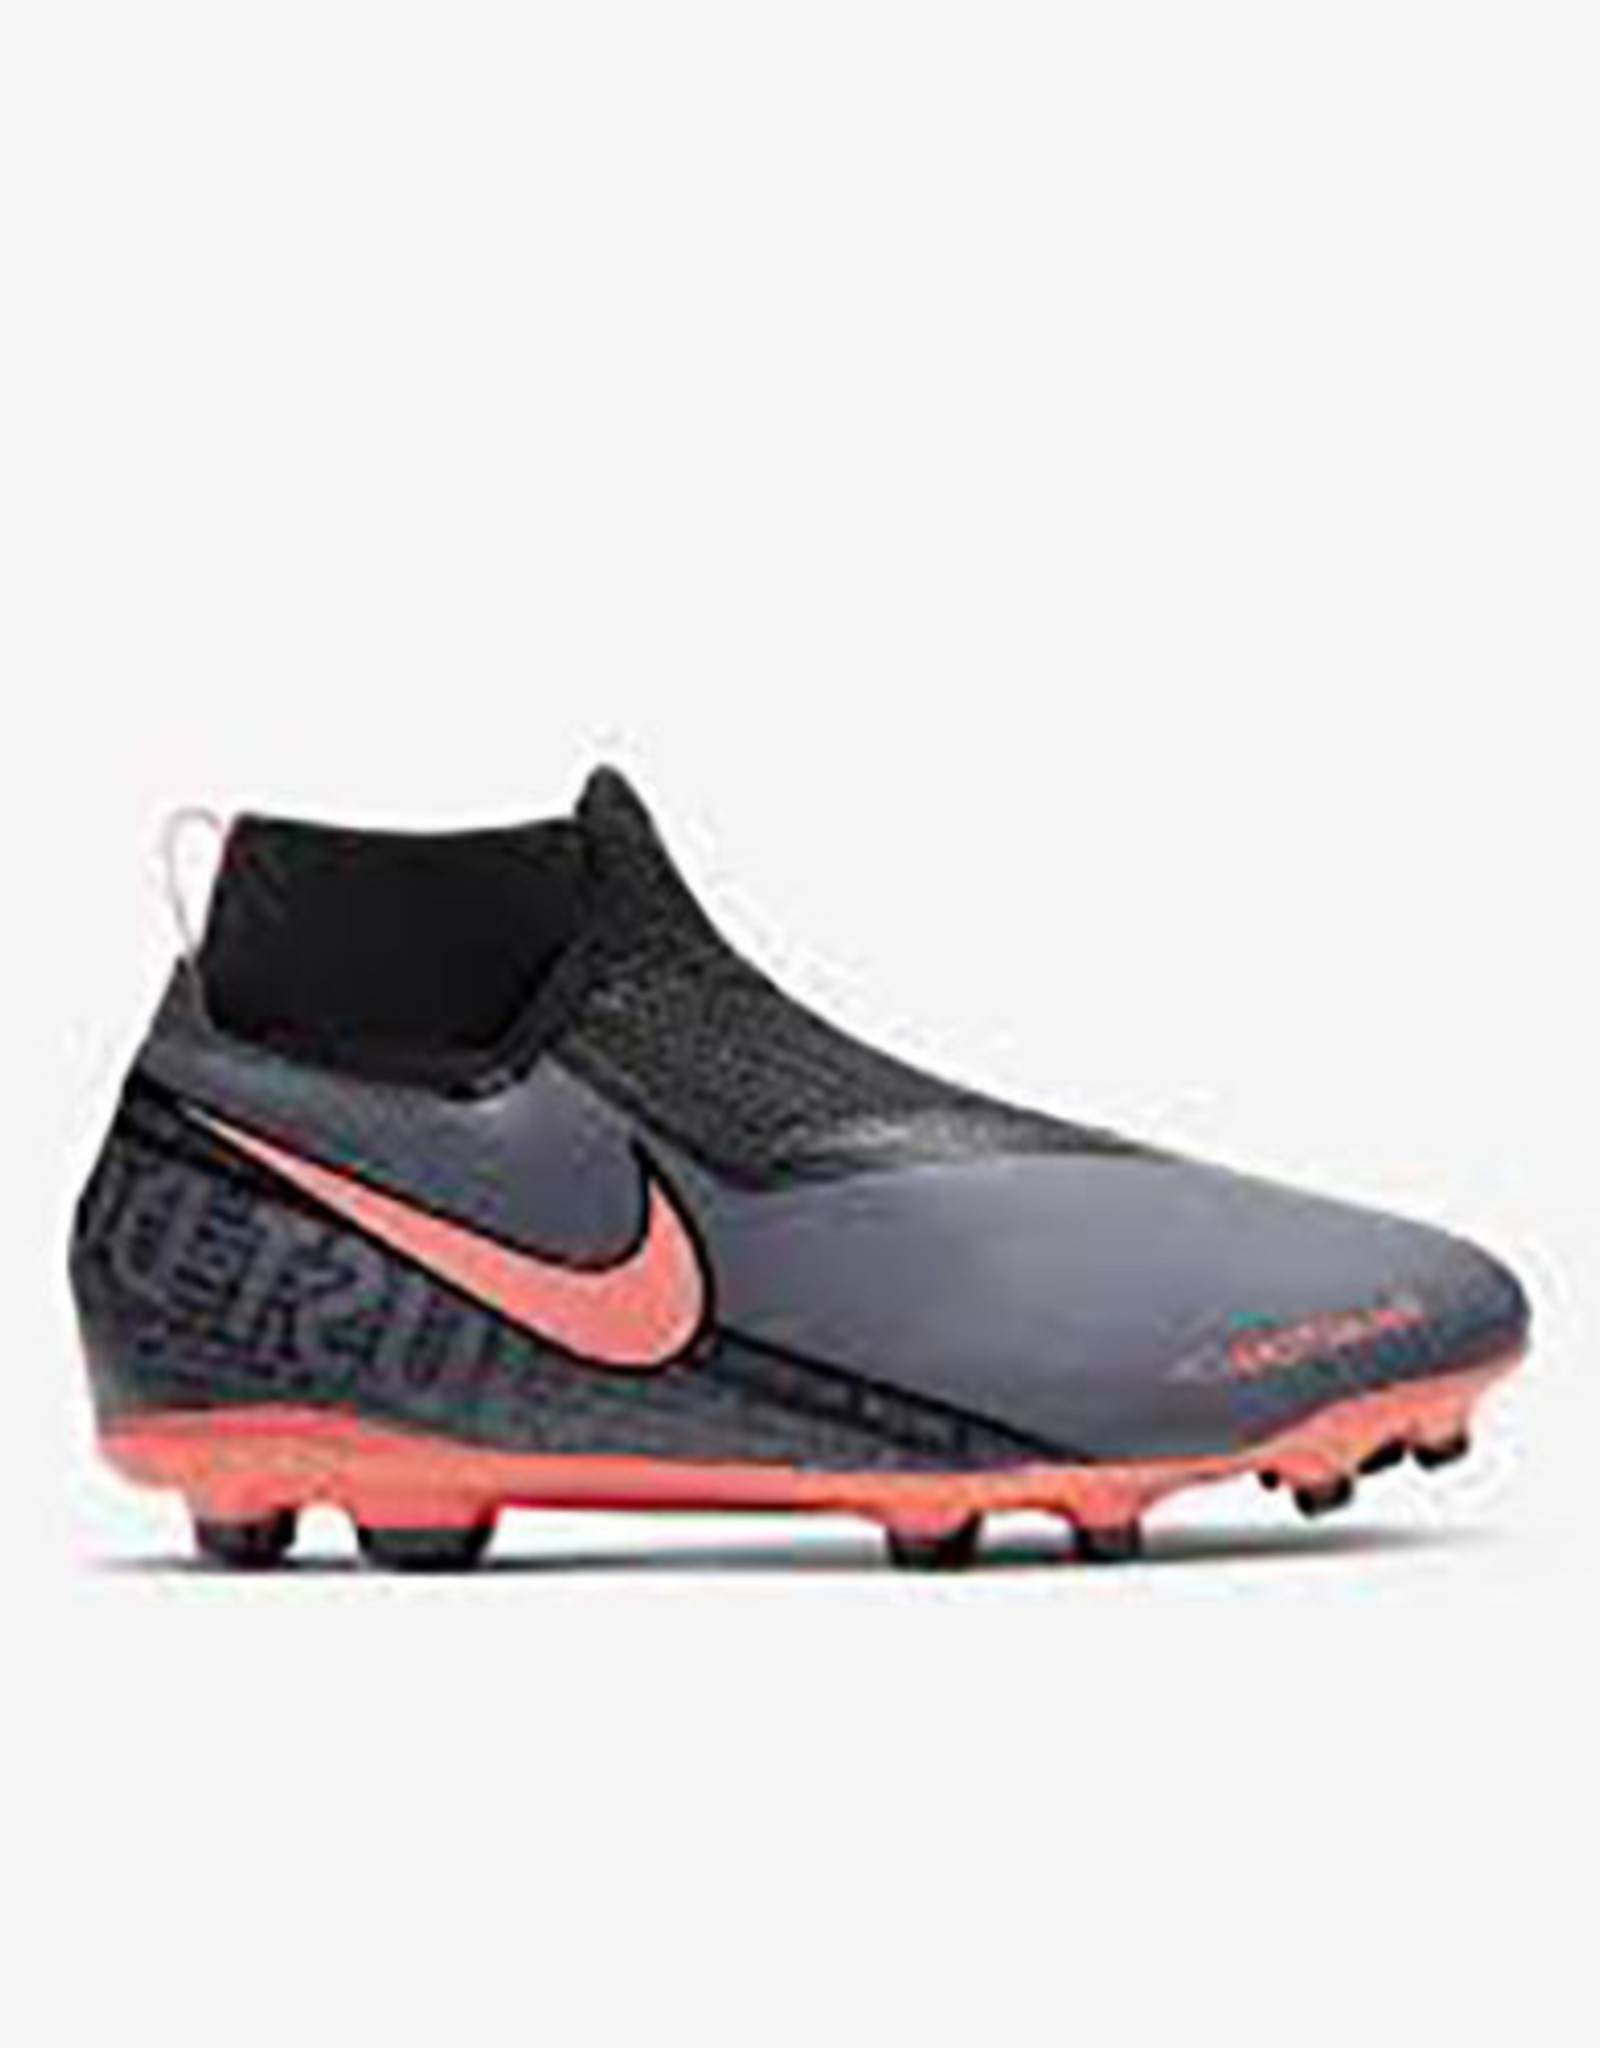 Nike Nike FG Phantom VSN Academy